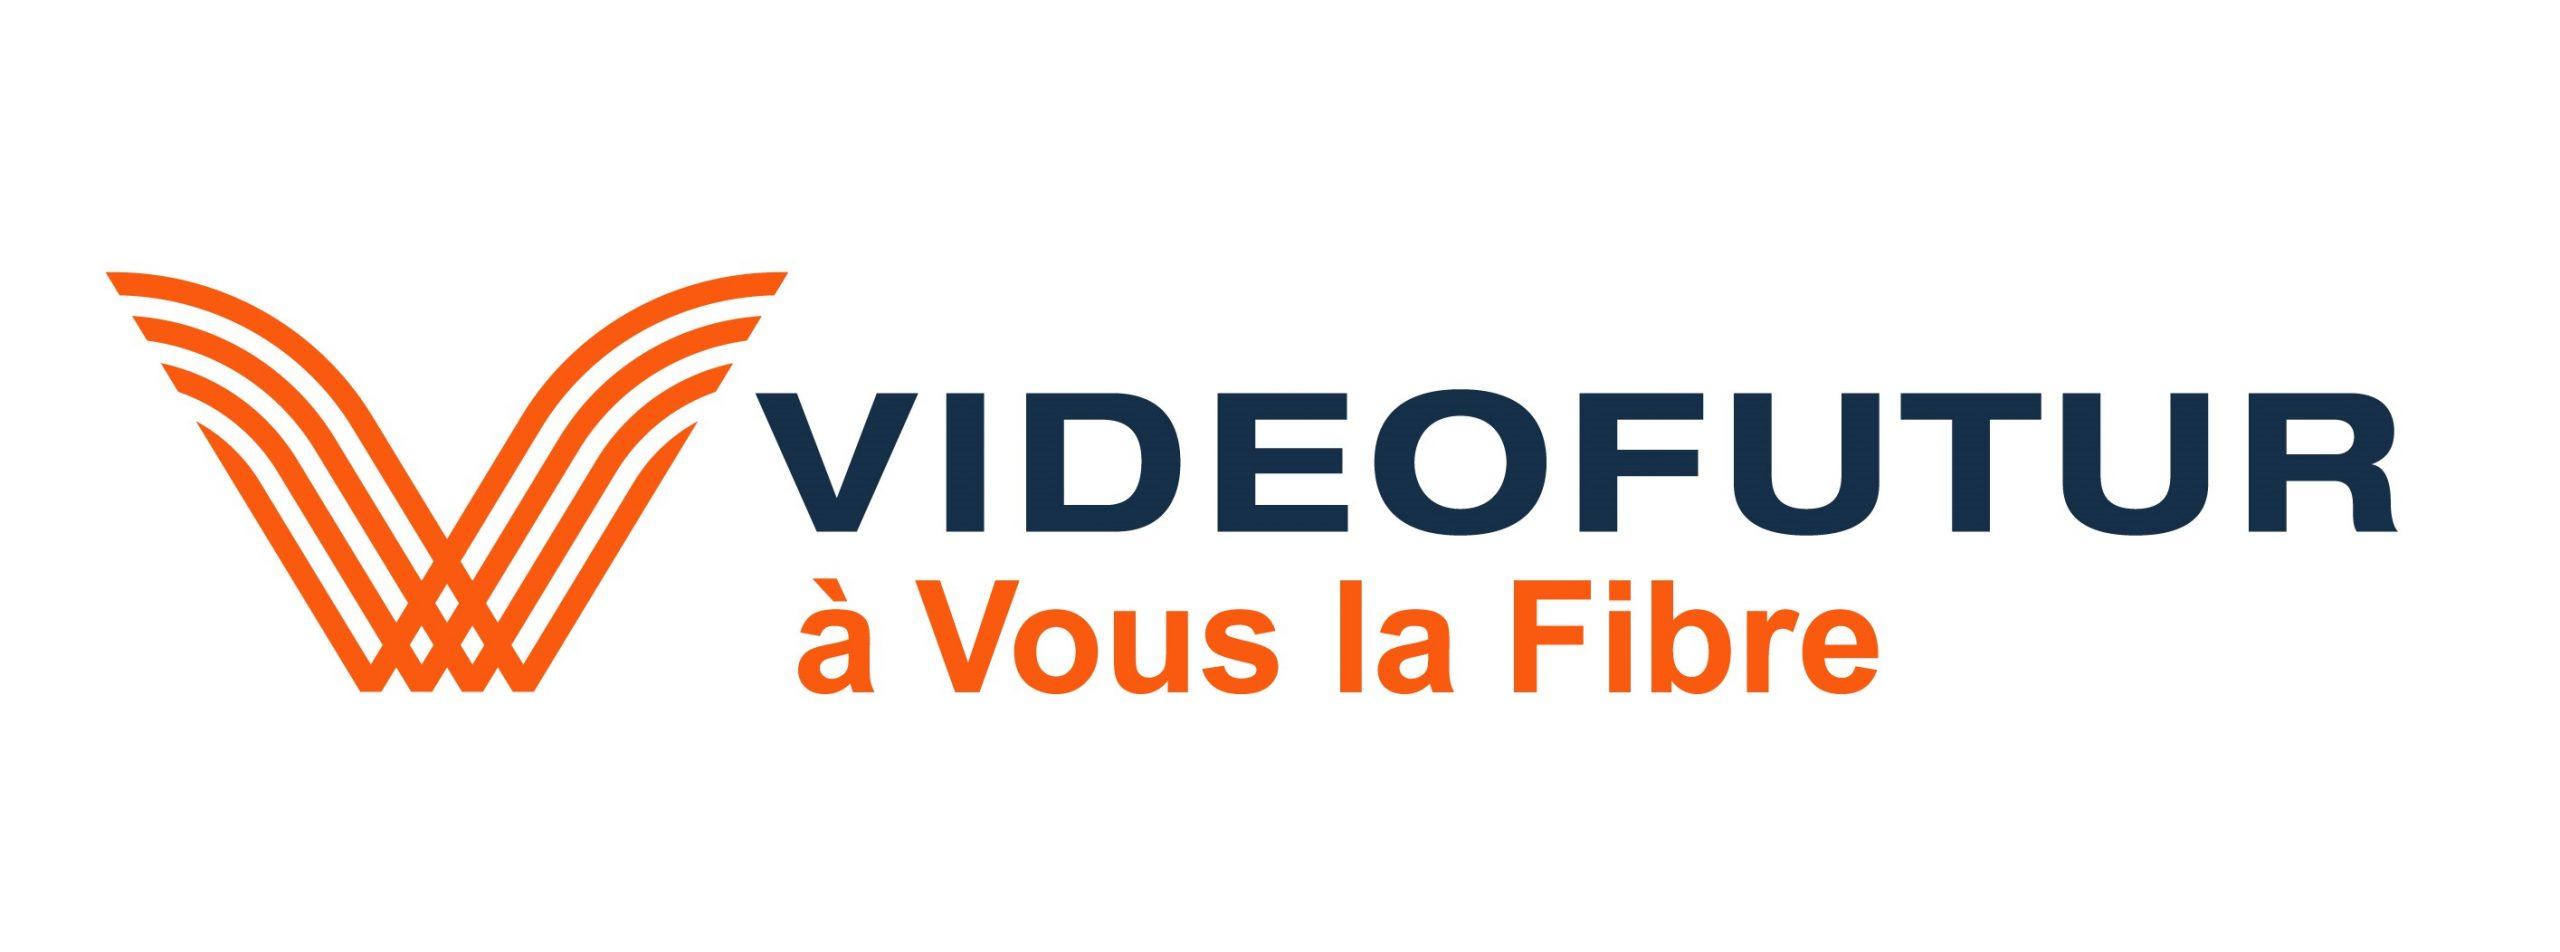 logo de Videofutur